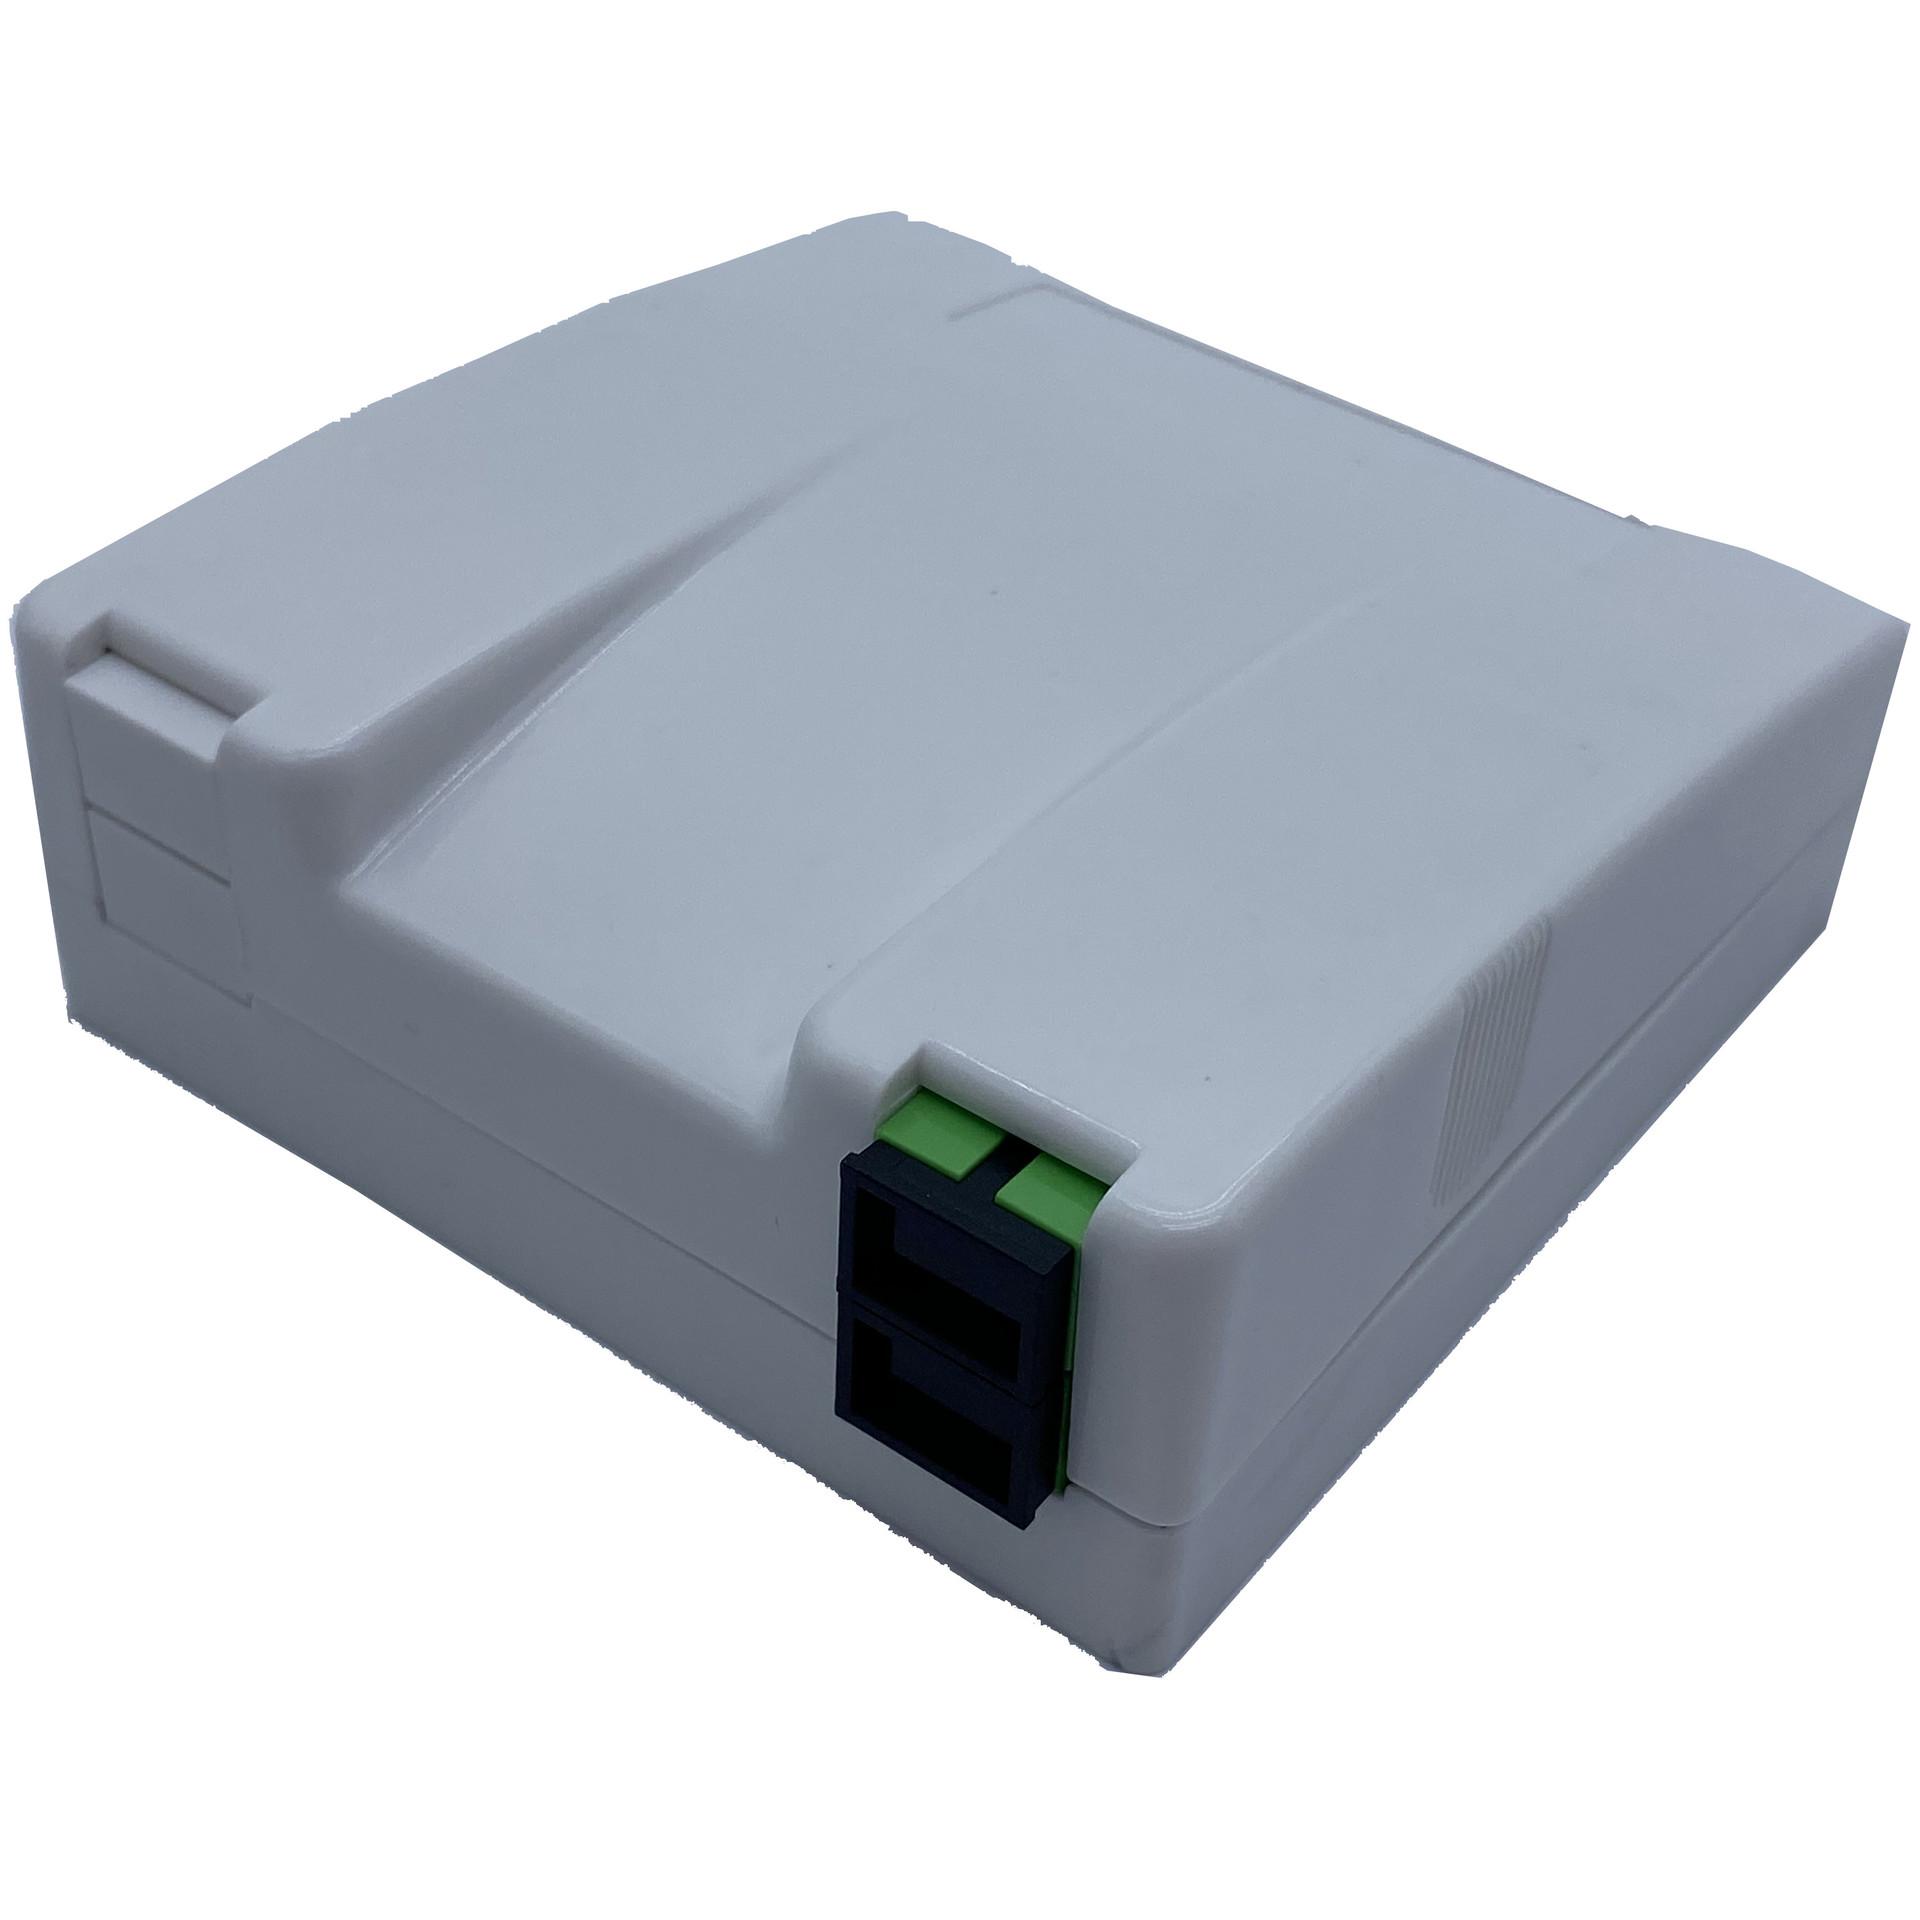 FTB104L 4 core fiber optic terminal box